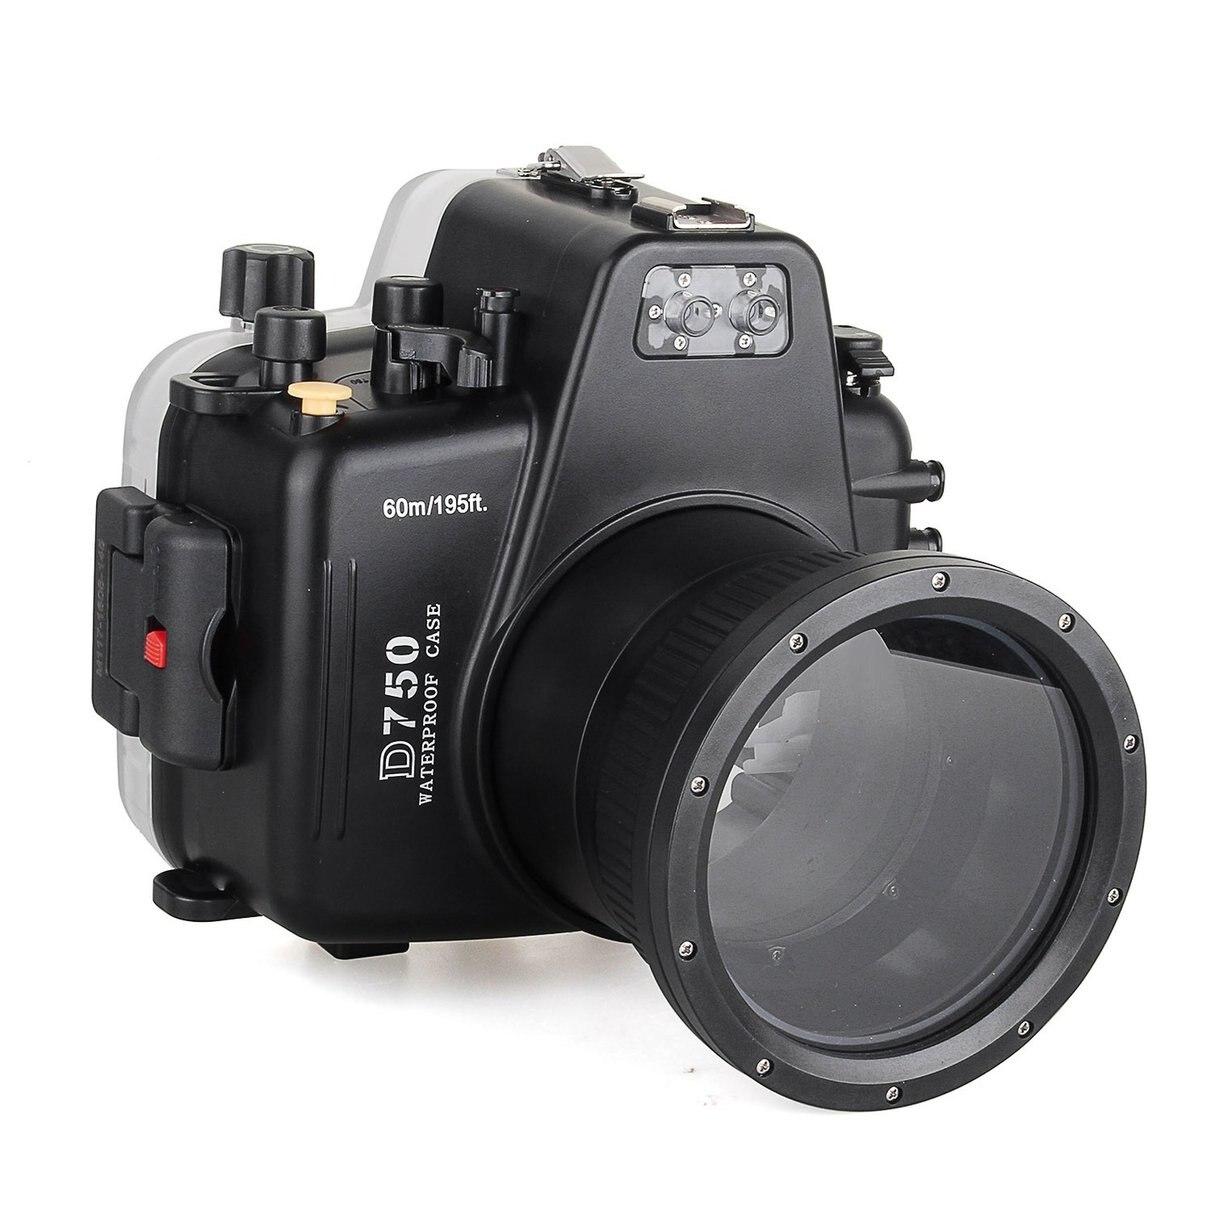 Meikon Waterproof Underwater Camera Housing Case Diving Equipment 60m/195ft for Nikon D750 meike mk d750 battery grip pack for nikon d750 dslr camera replacement mb d16 as en el15 battery